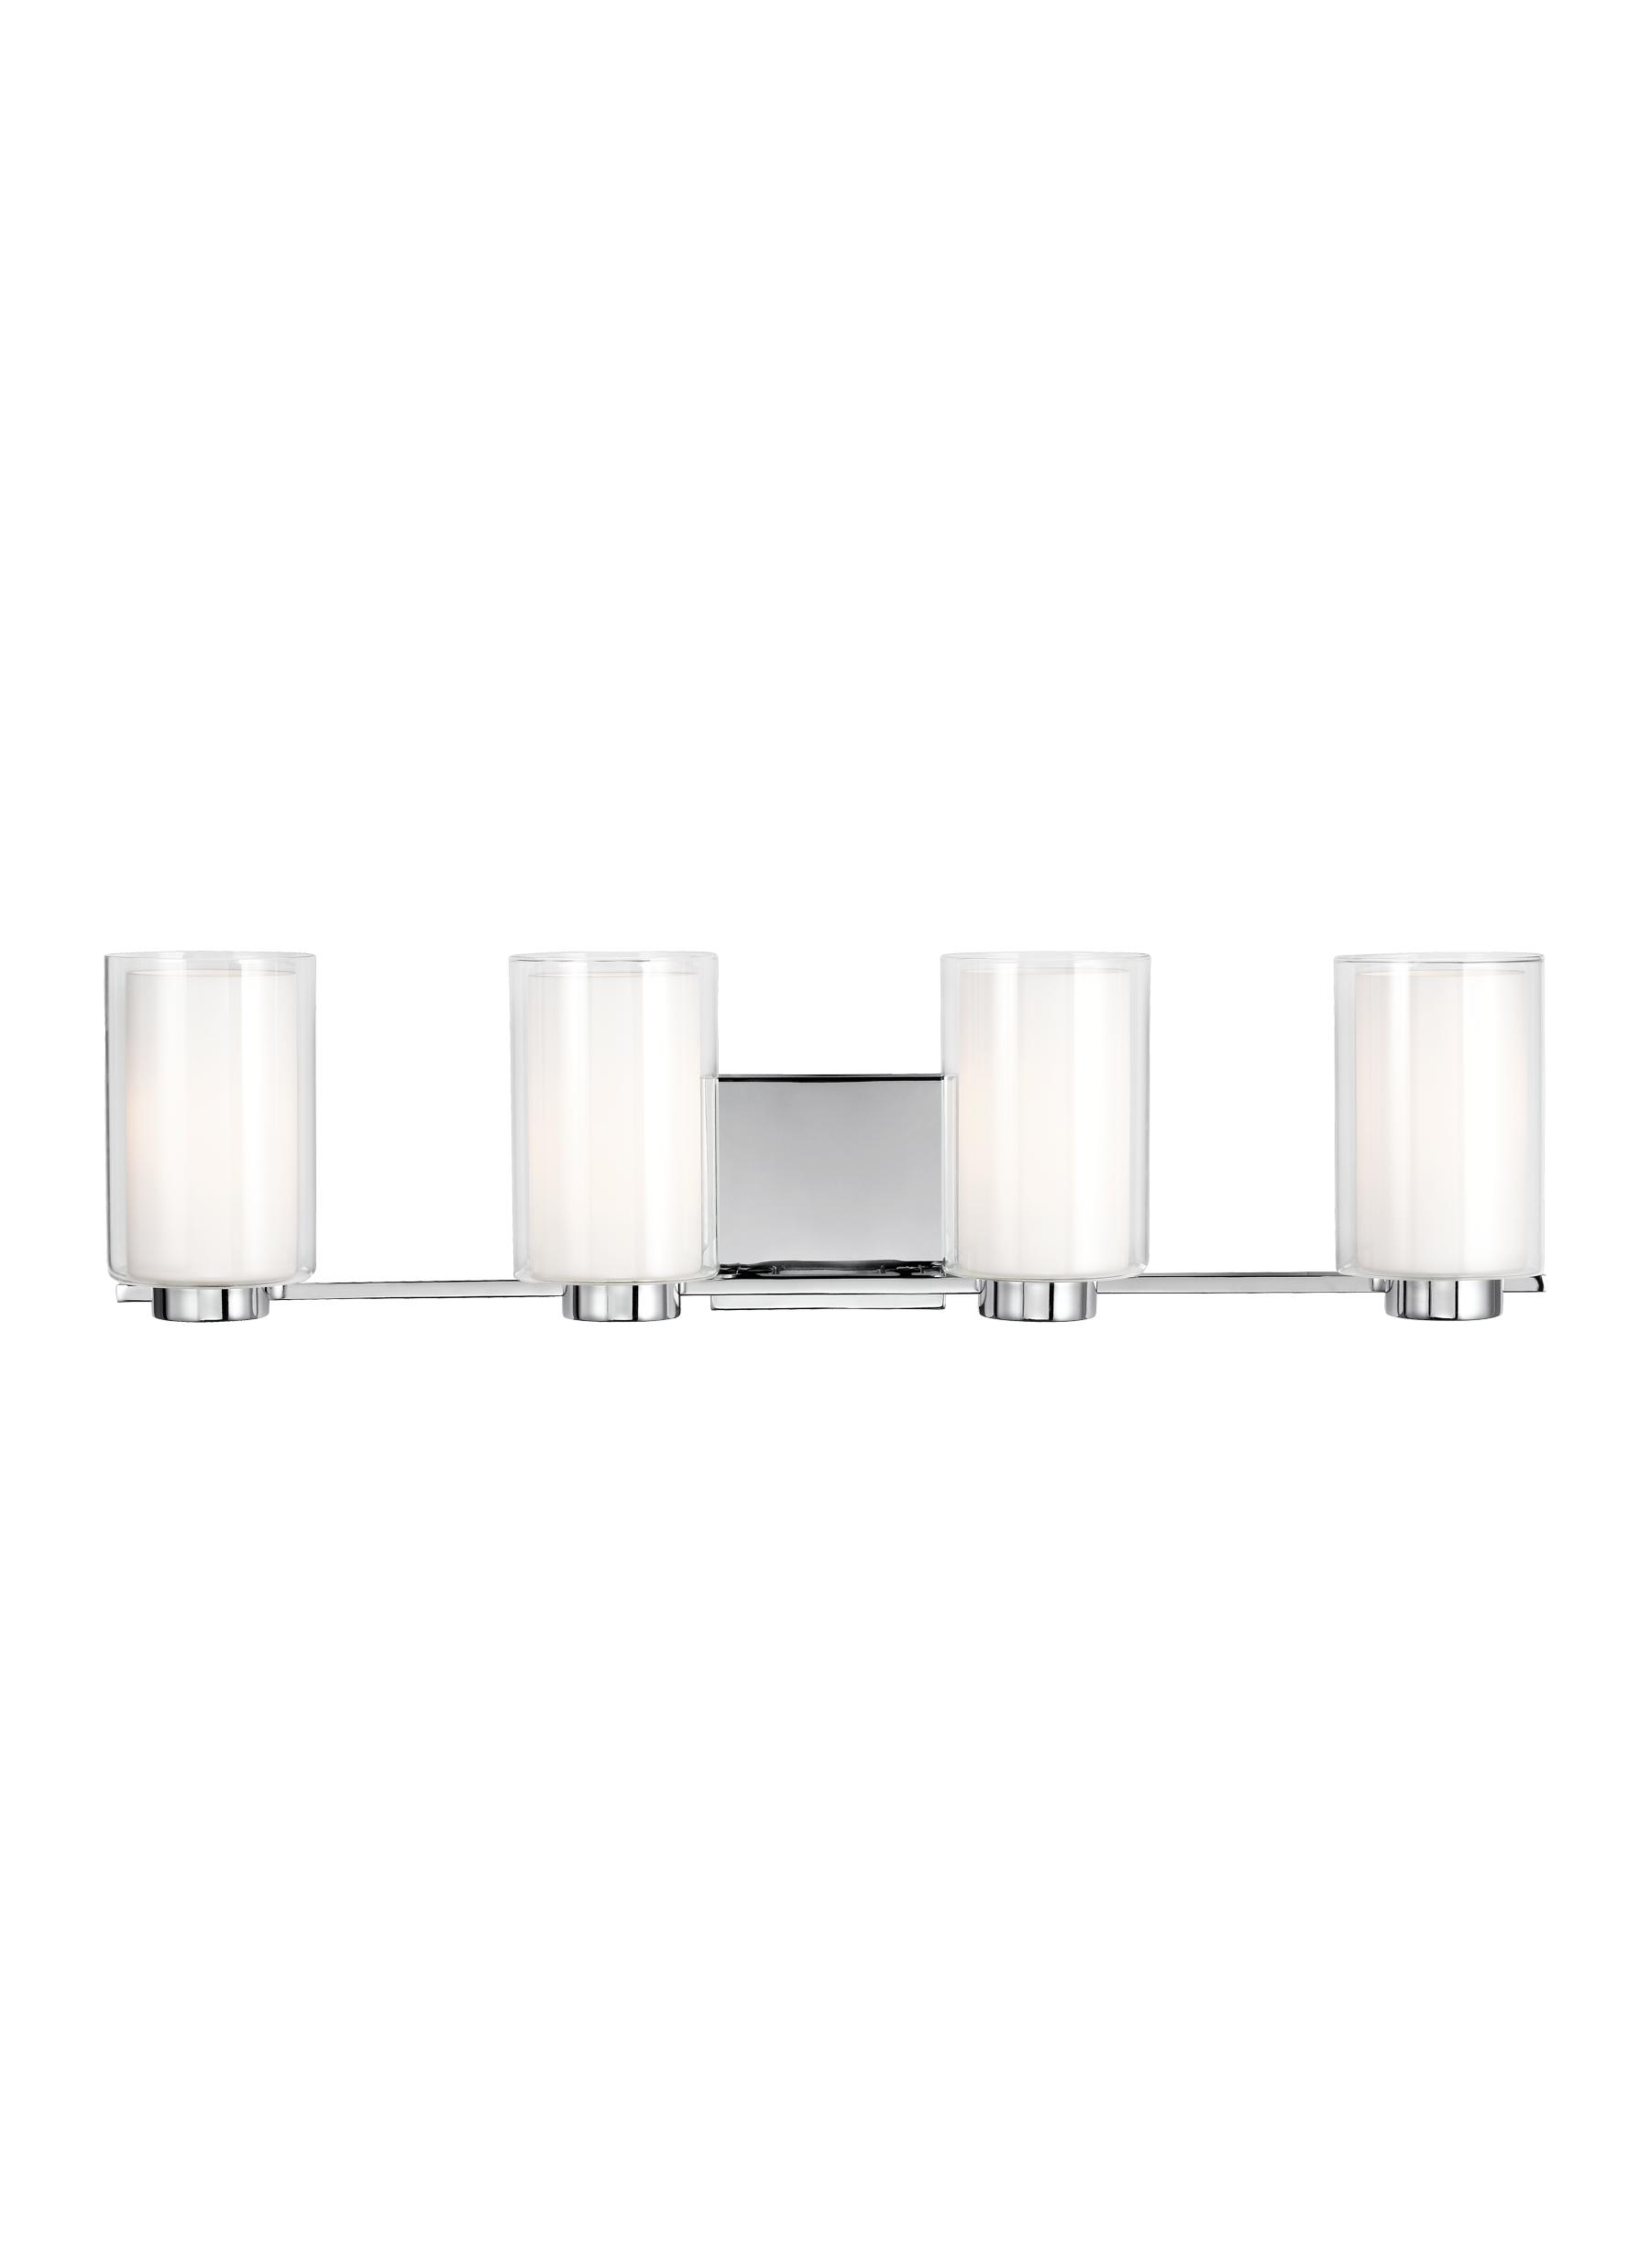 4 light vanity lantern style vanity light vanity loading zoom vs22604ch4 vanitychrome